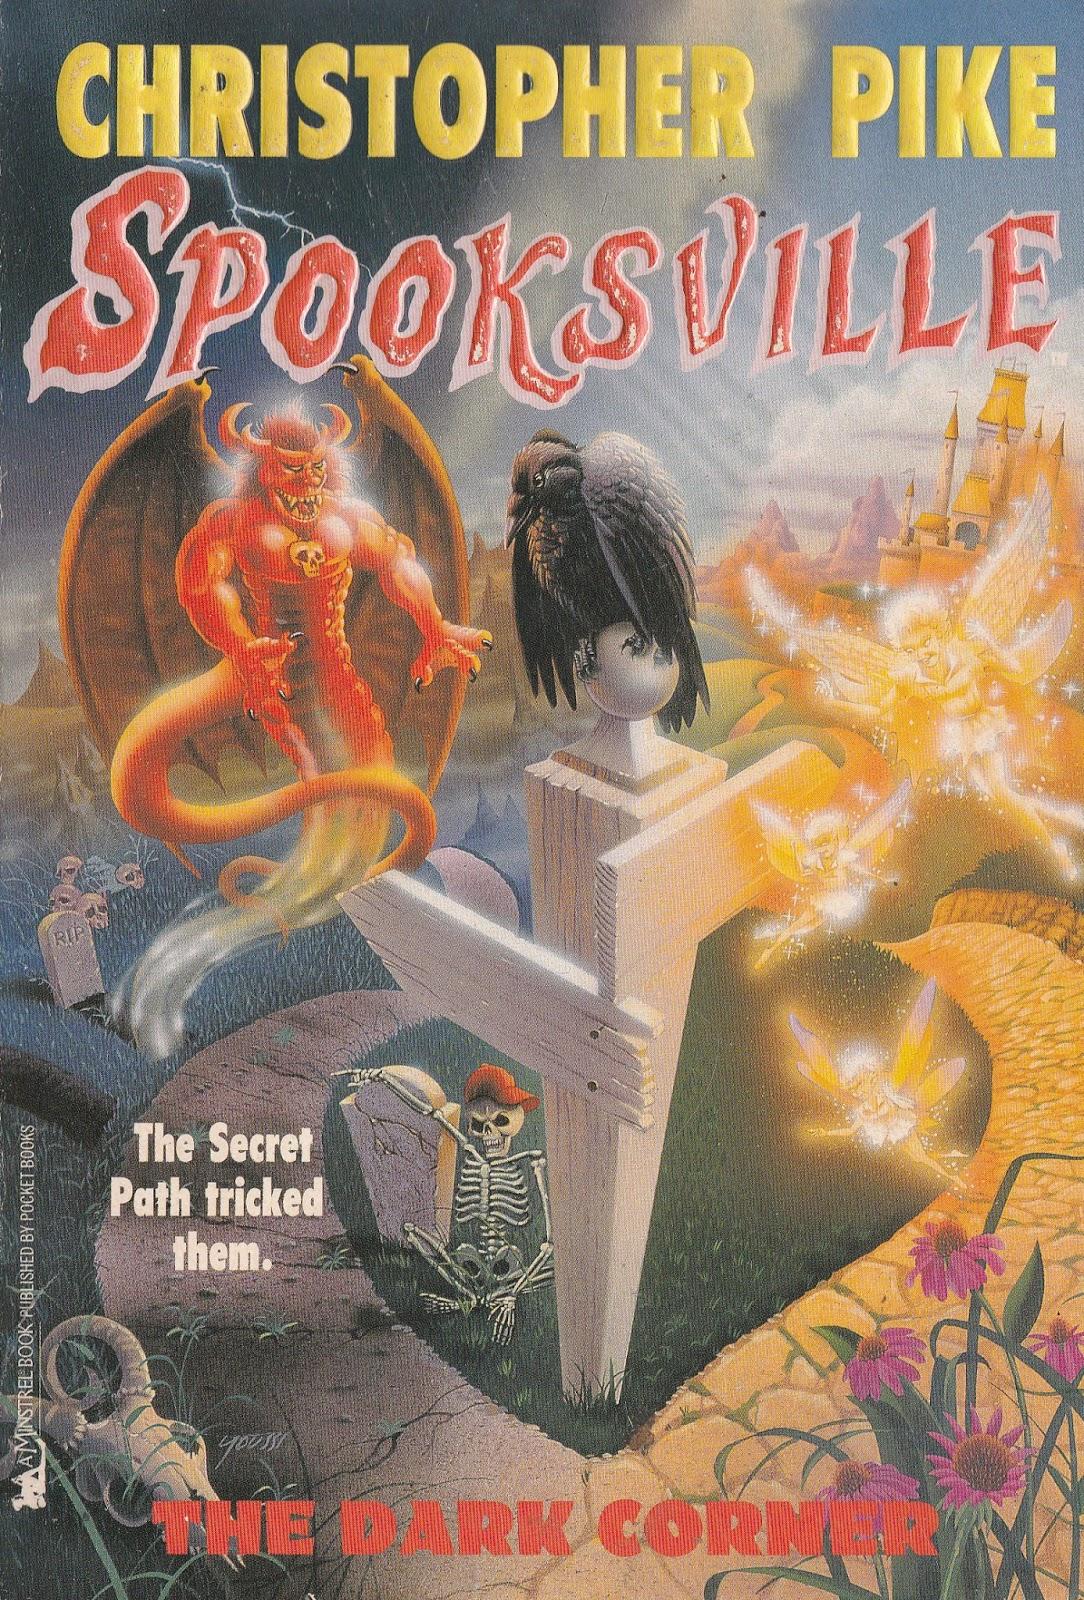 Series Books For Girls Spooksville 7 The Dark Corner And